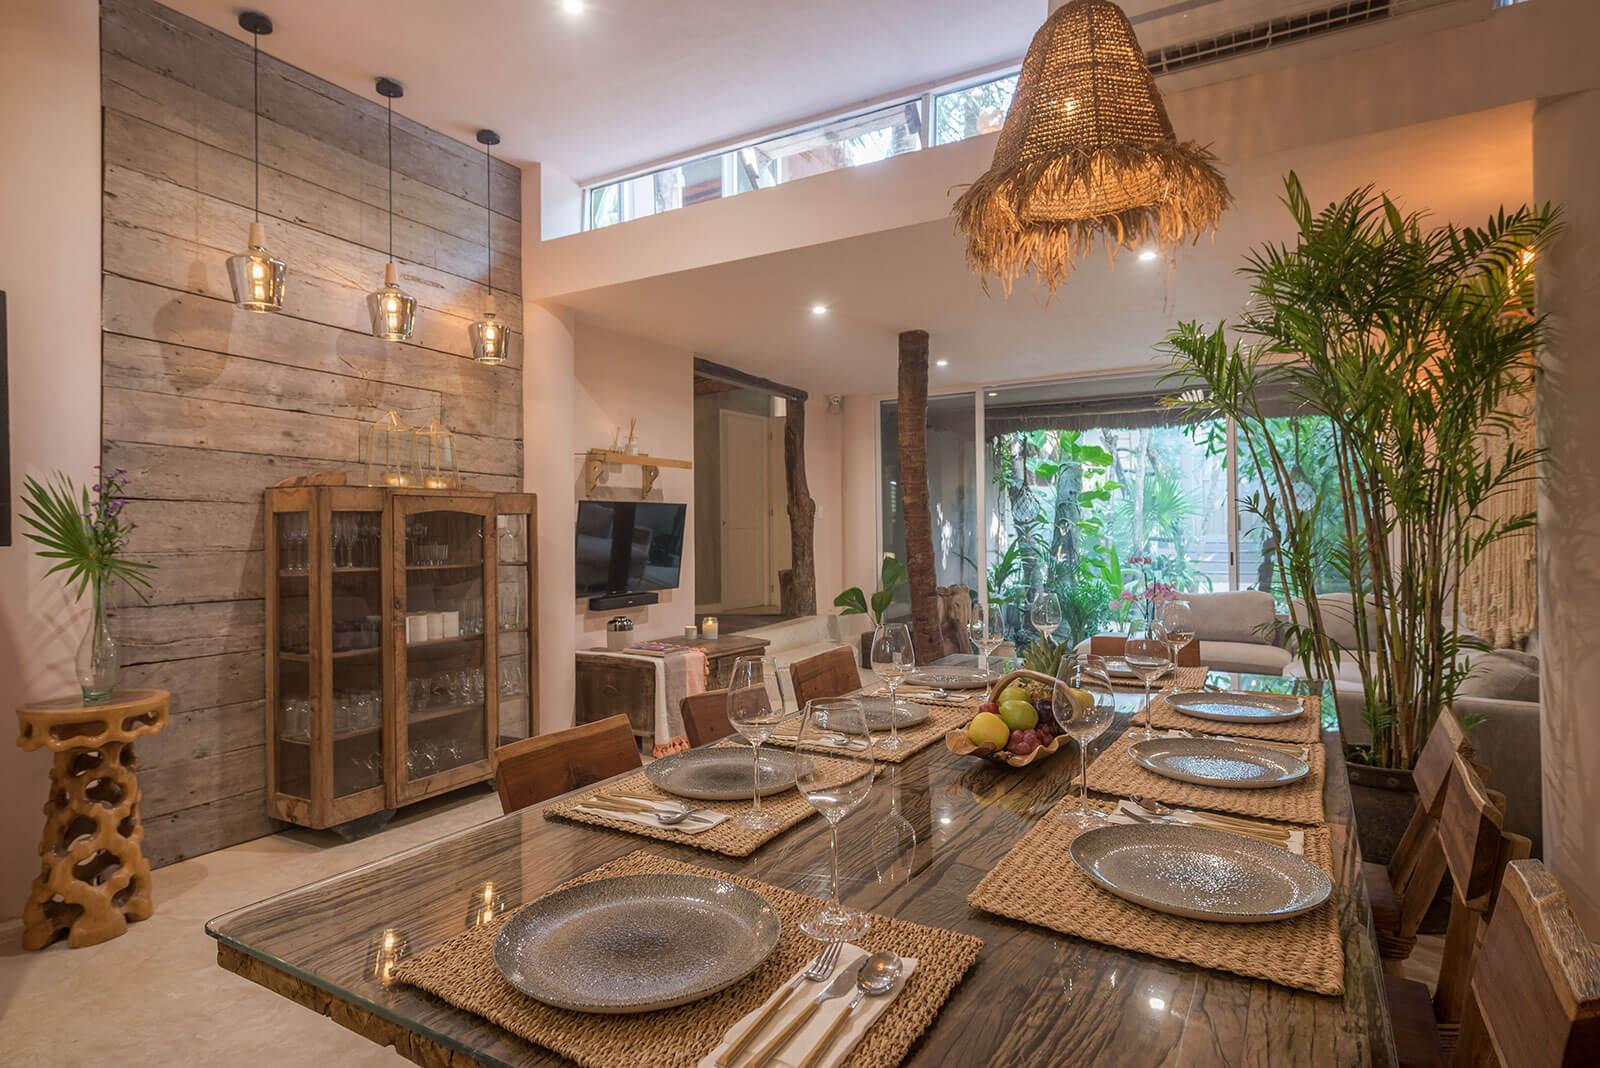 Maya_Luxe_Riviera_Maya_Luxury_Vacations_Villa_Rentals_Tulum_Playa_del_Carmen_Mexico_Bejuco_House_12.jpg